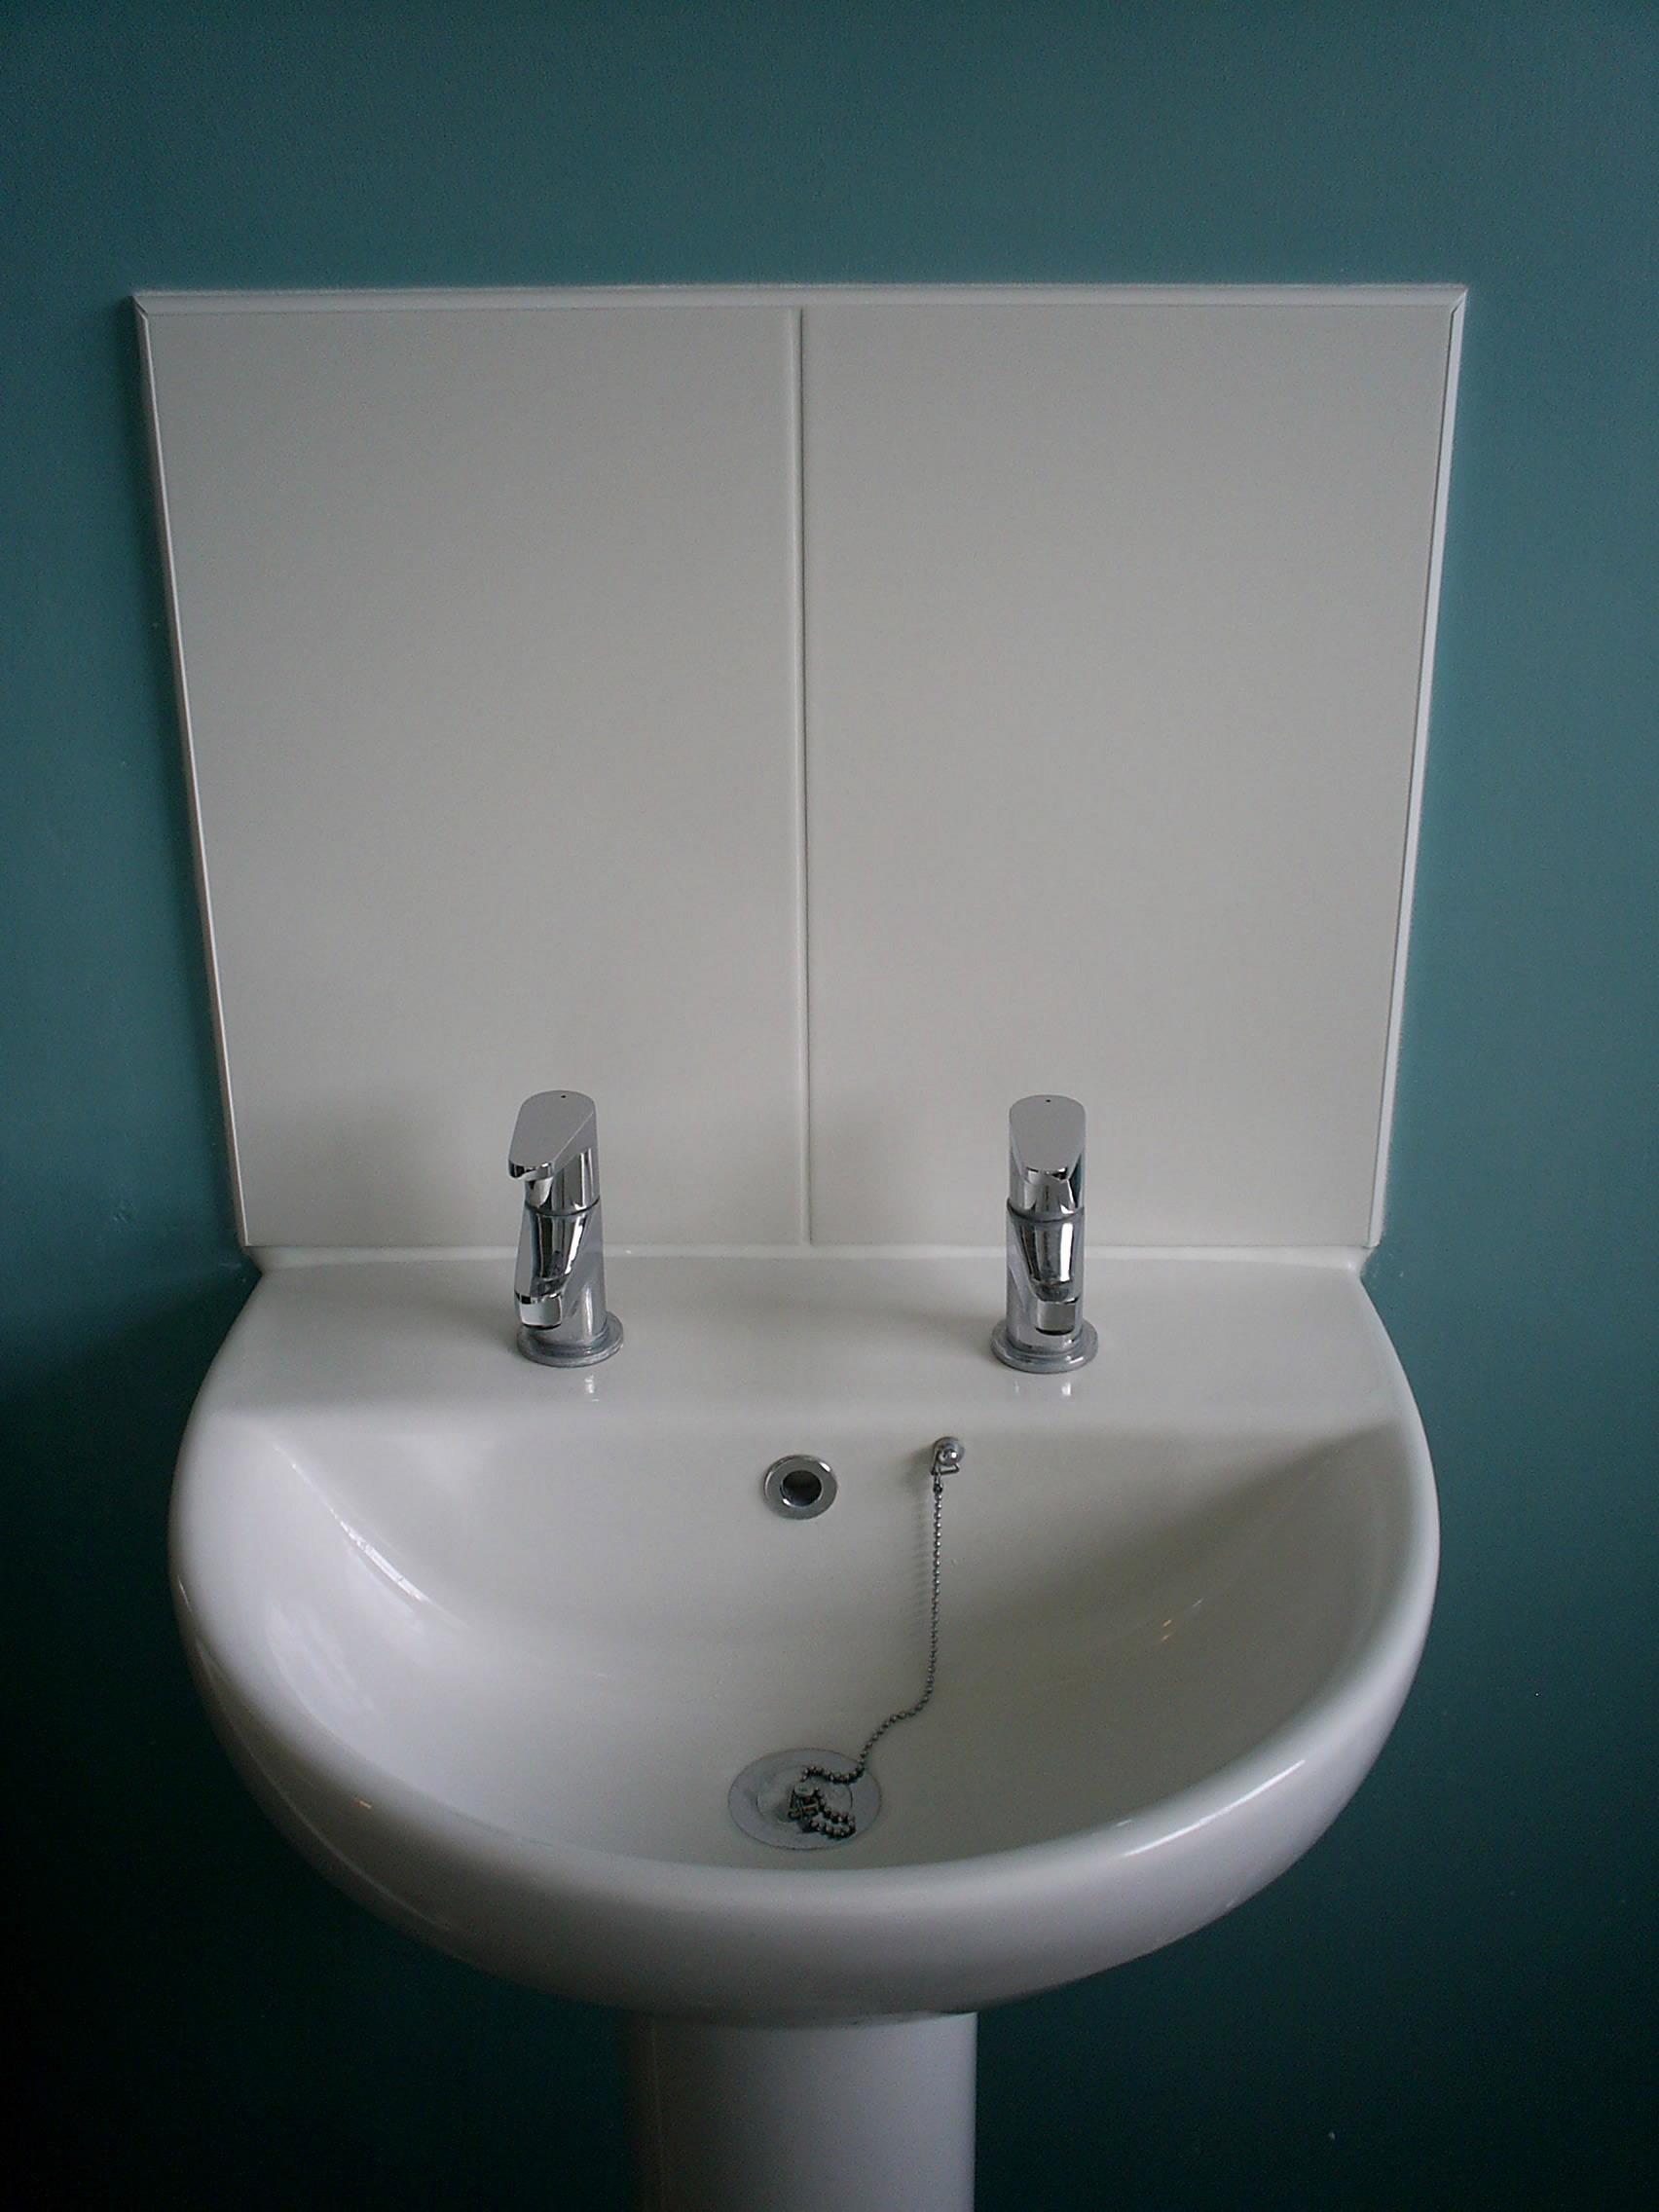 Splashback For Bathroom Sink